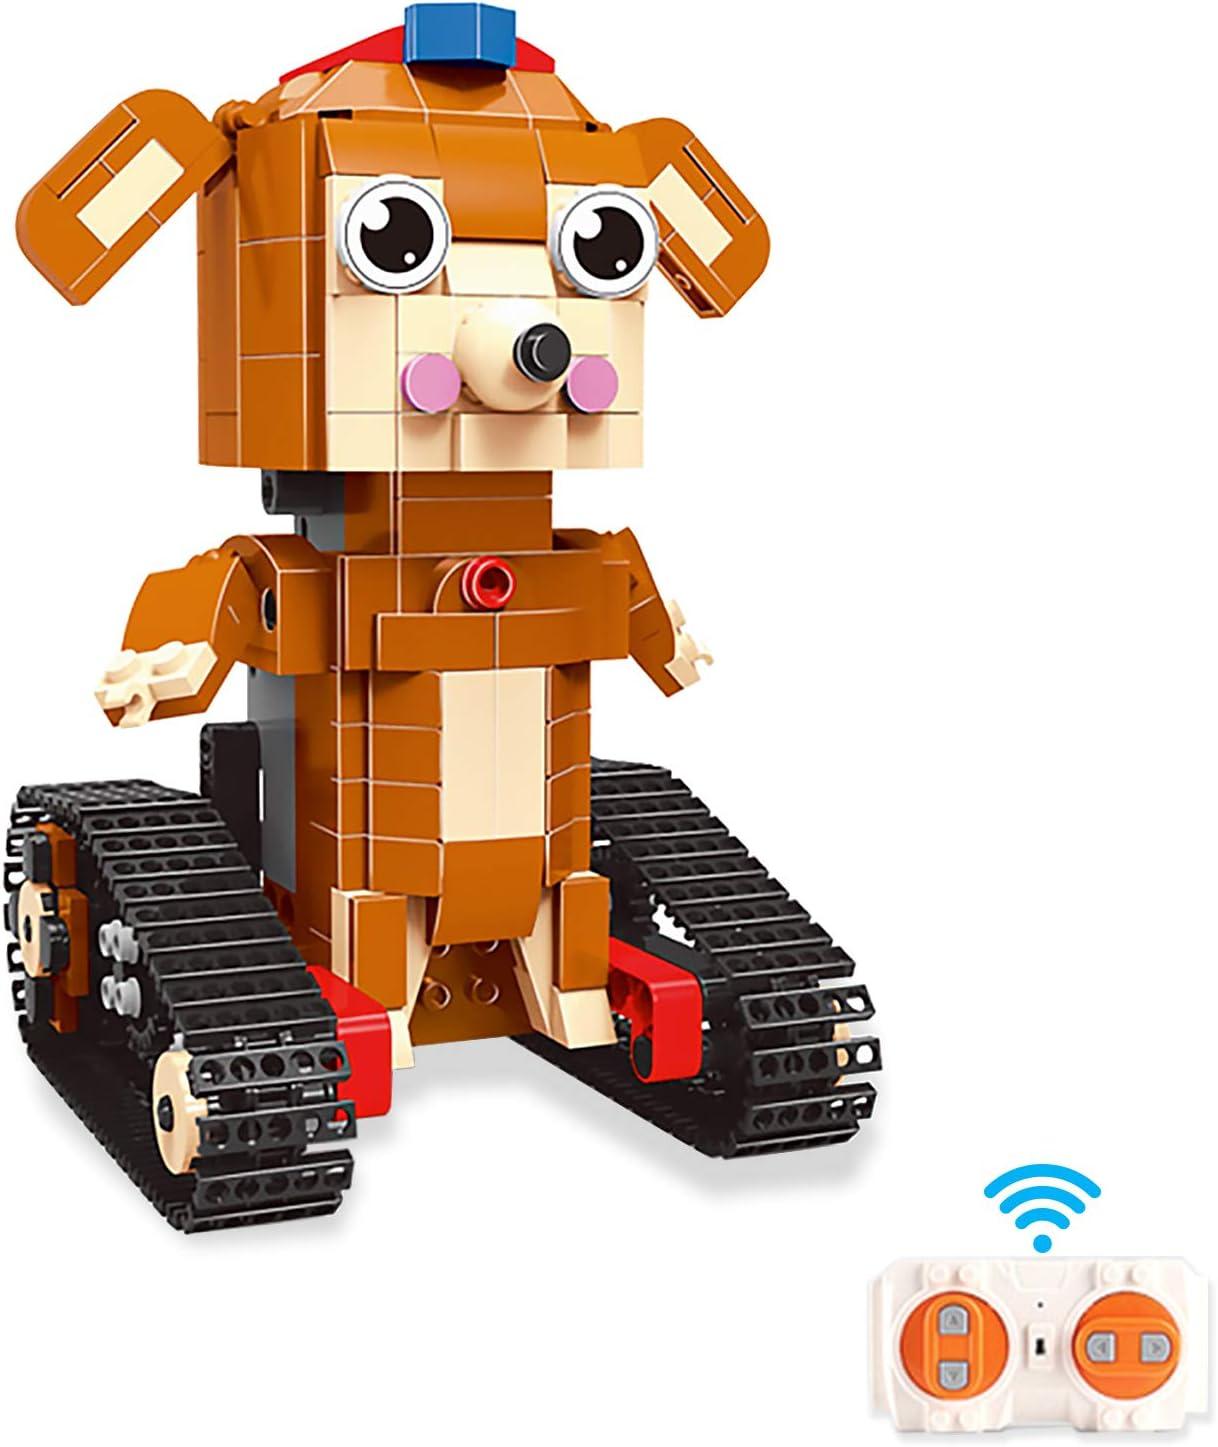 AMLINK Building Blocks Robot Toy Dog for STEM Kids Max 52% OFF 8-12 Super popular specialty store E